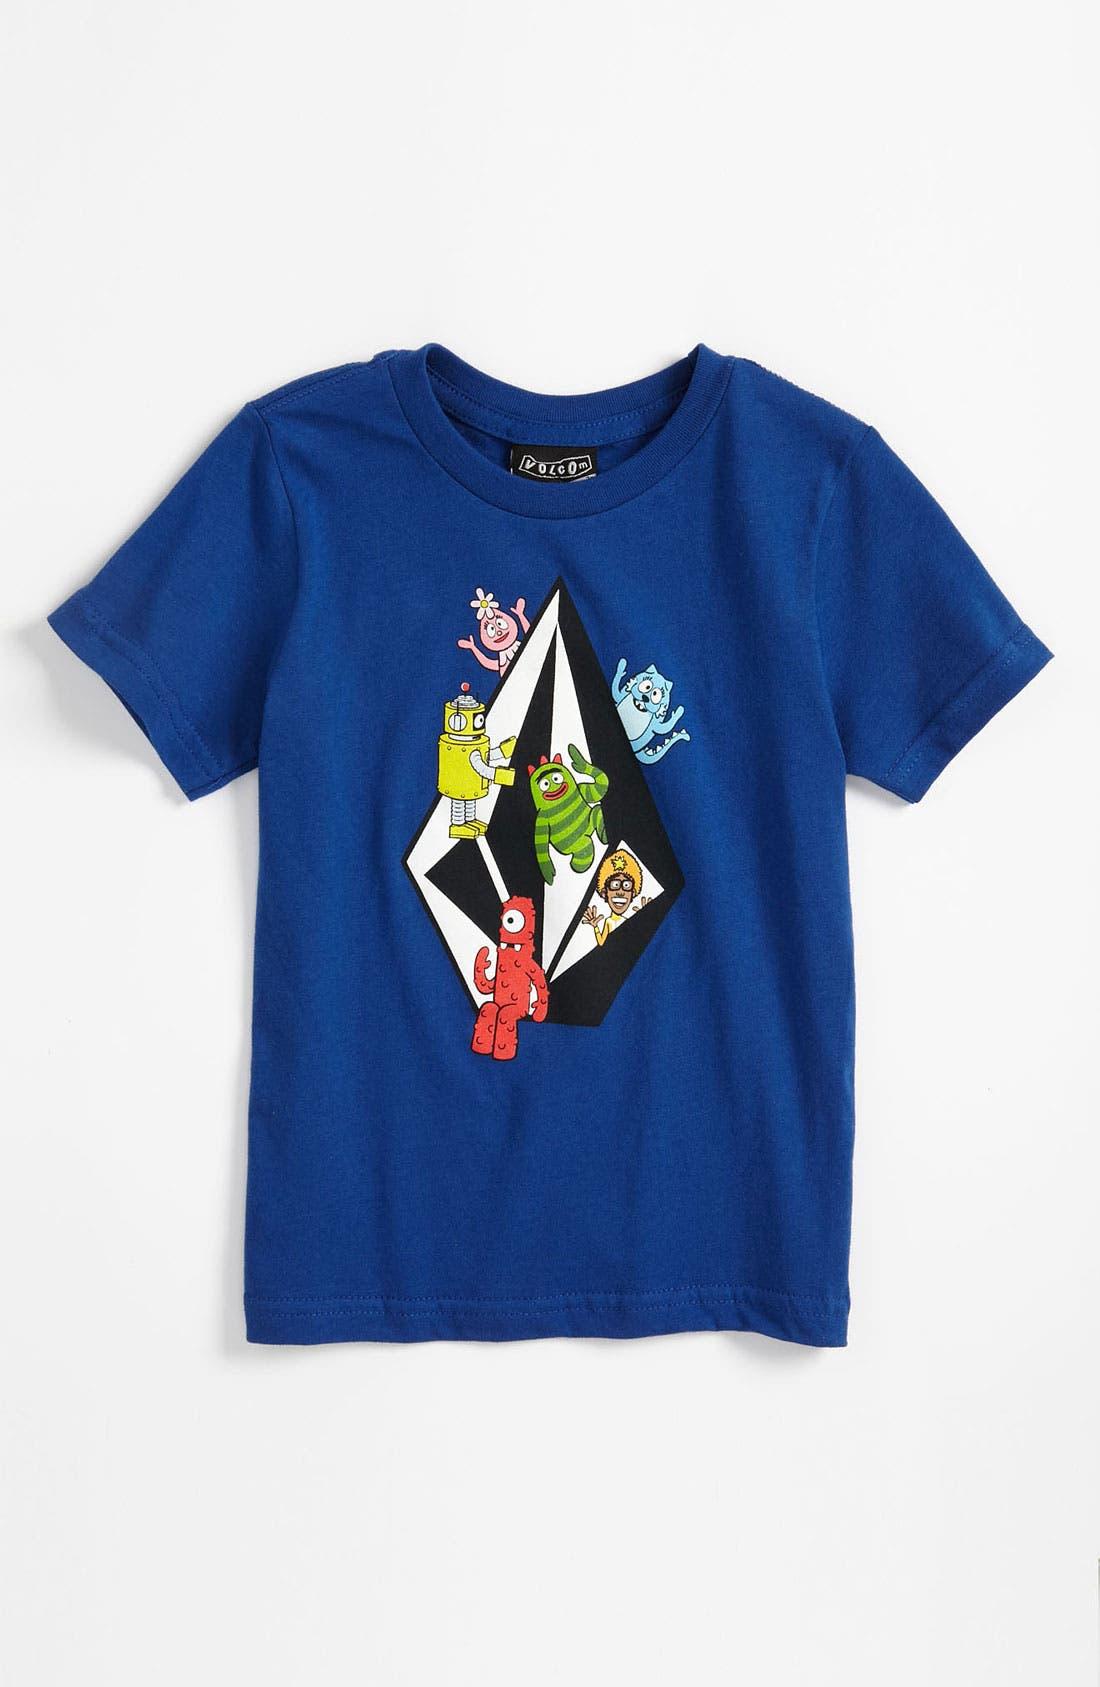 Alternate Image 1 Selected - Volcom 'Yo Gabba Gabba!' T-Shirt (Little Boys)